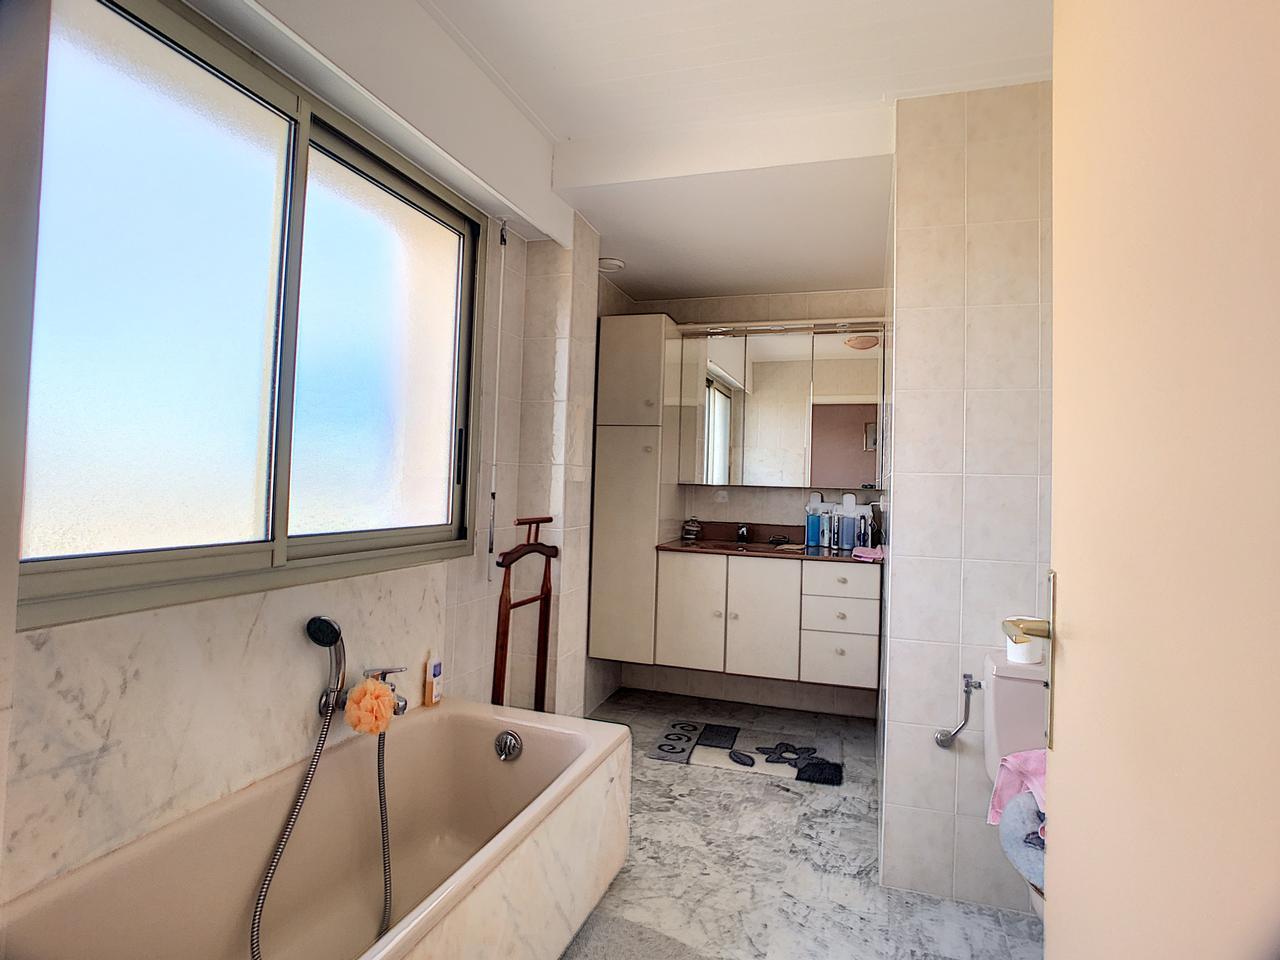 Salle De Bain Antibes immobilier nice vue mer appartement antibes appartement 3 pieces